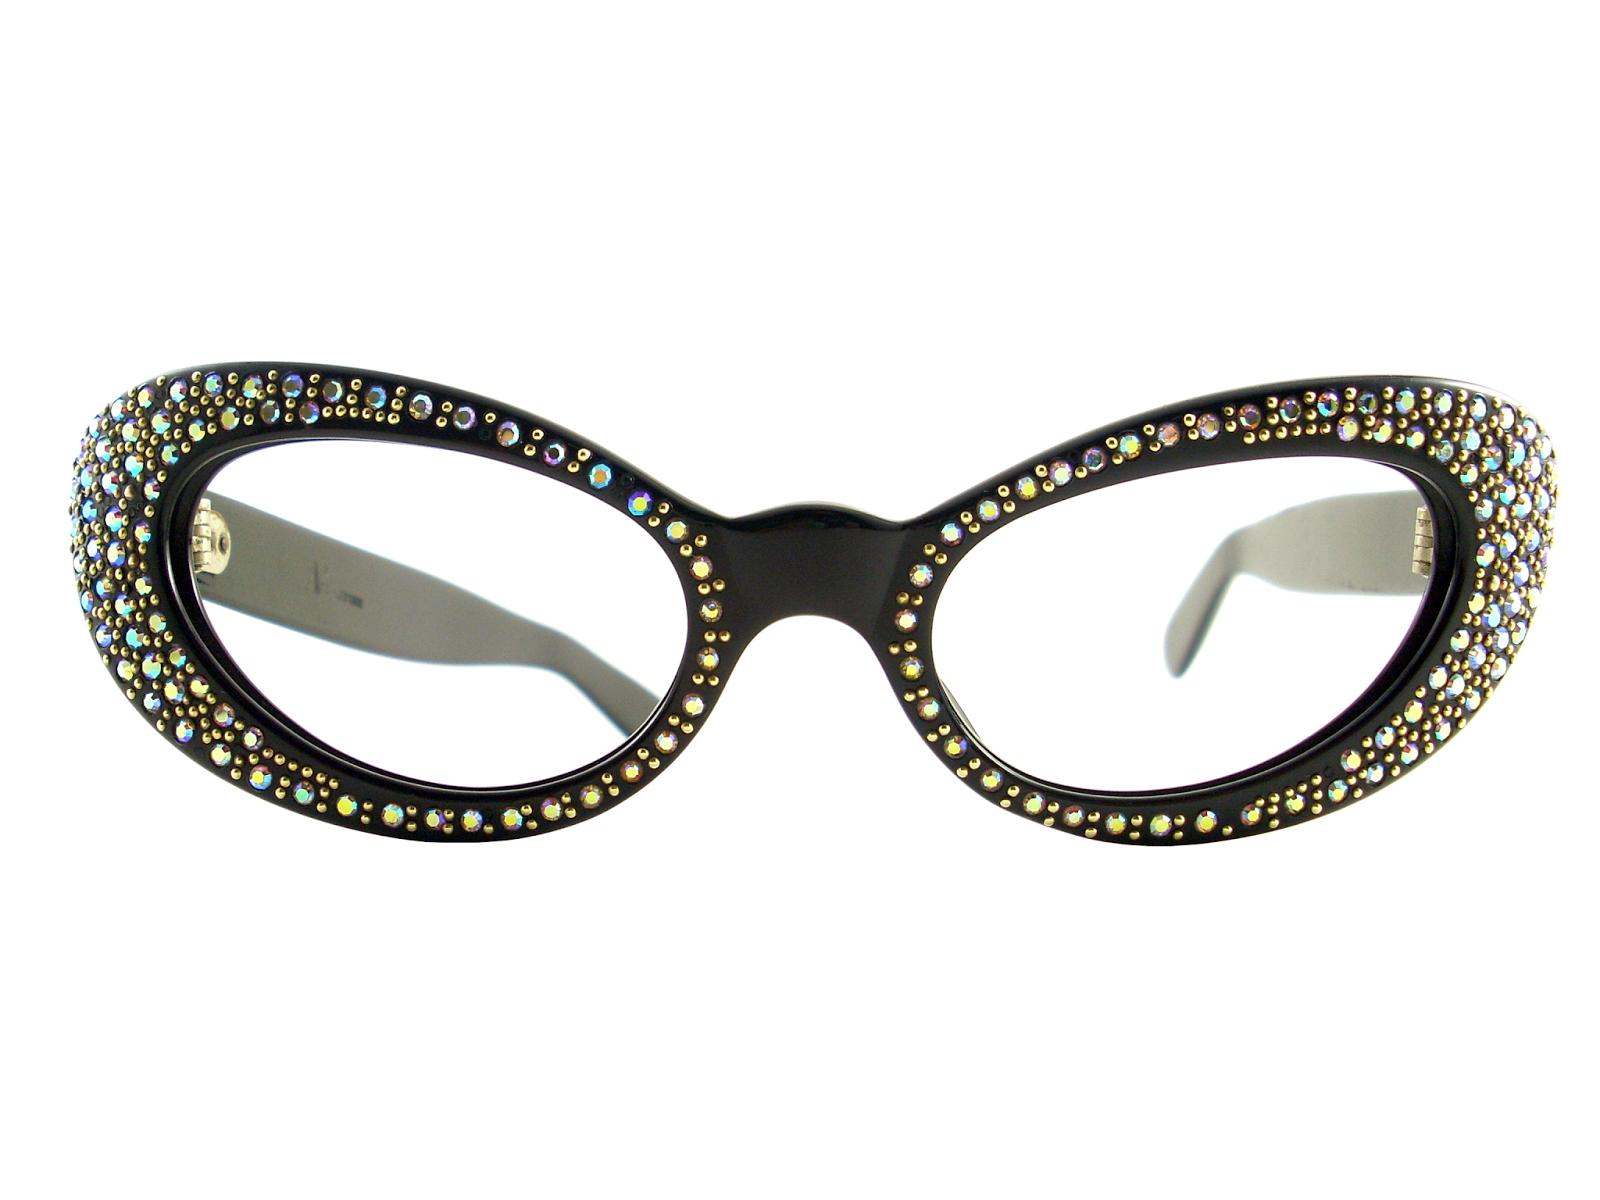 Cat Eye Frame Eye Glasses : Vintage Eyeglasses Frames Eyewear Sunglasses 50S: VINTAGE ...